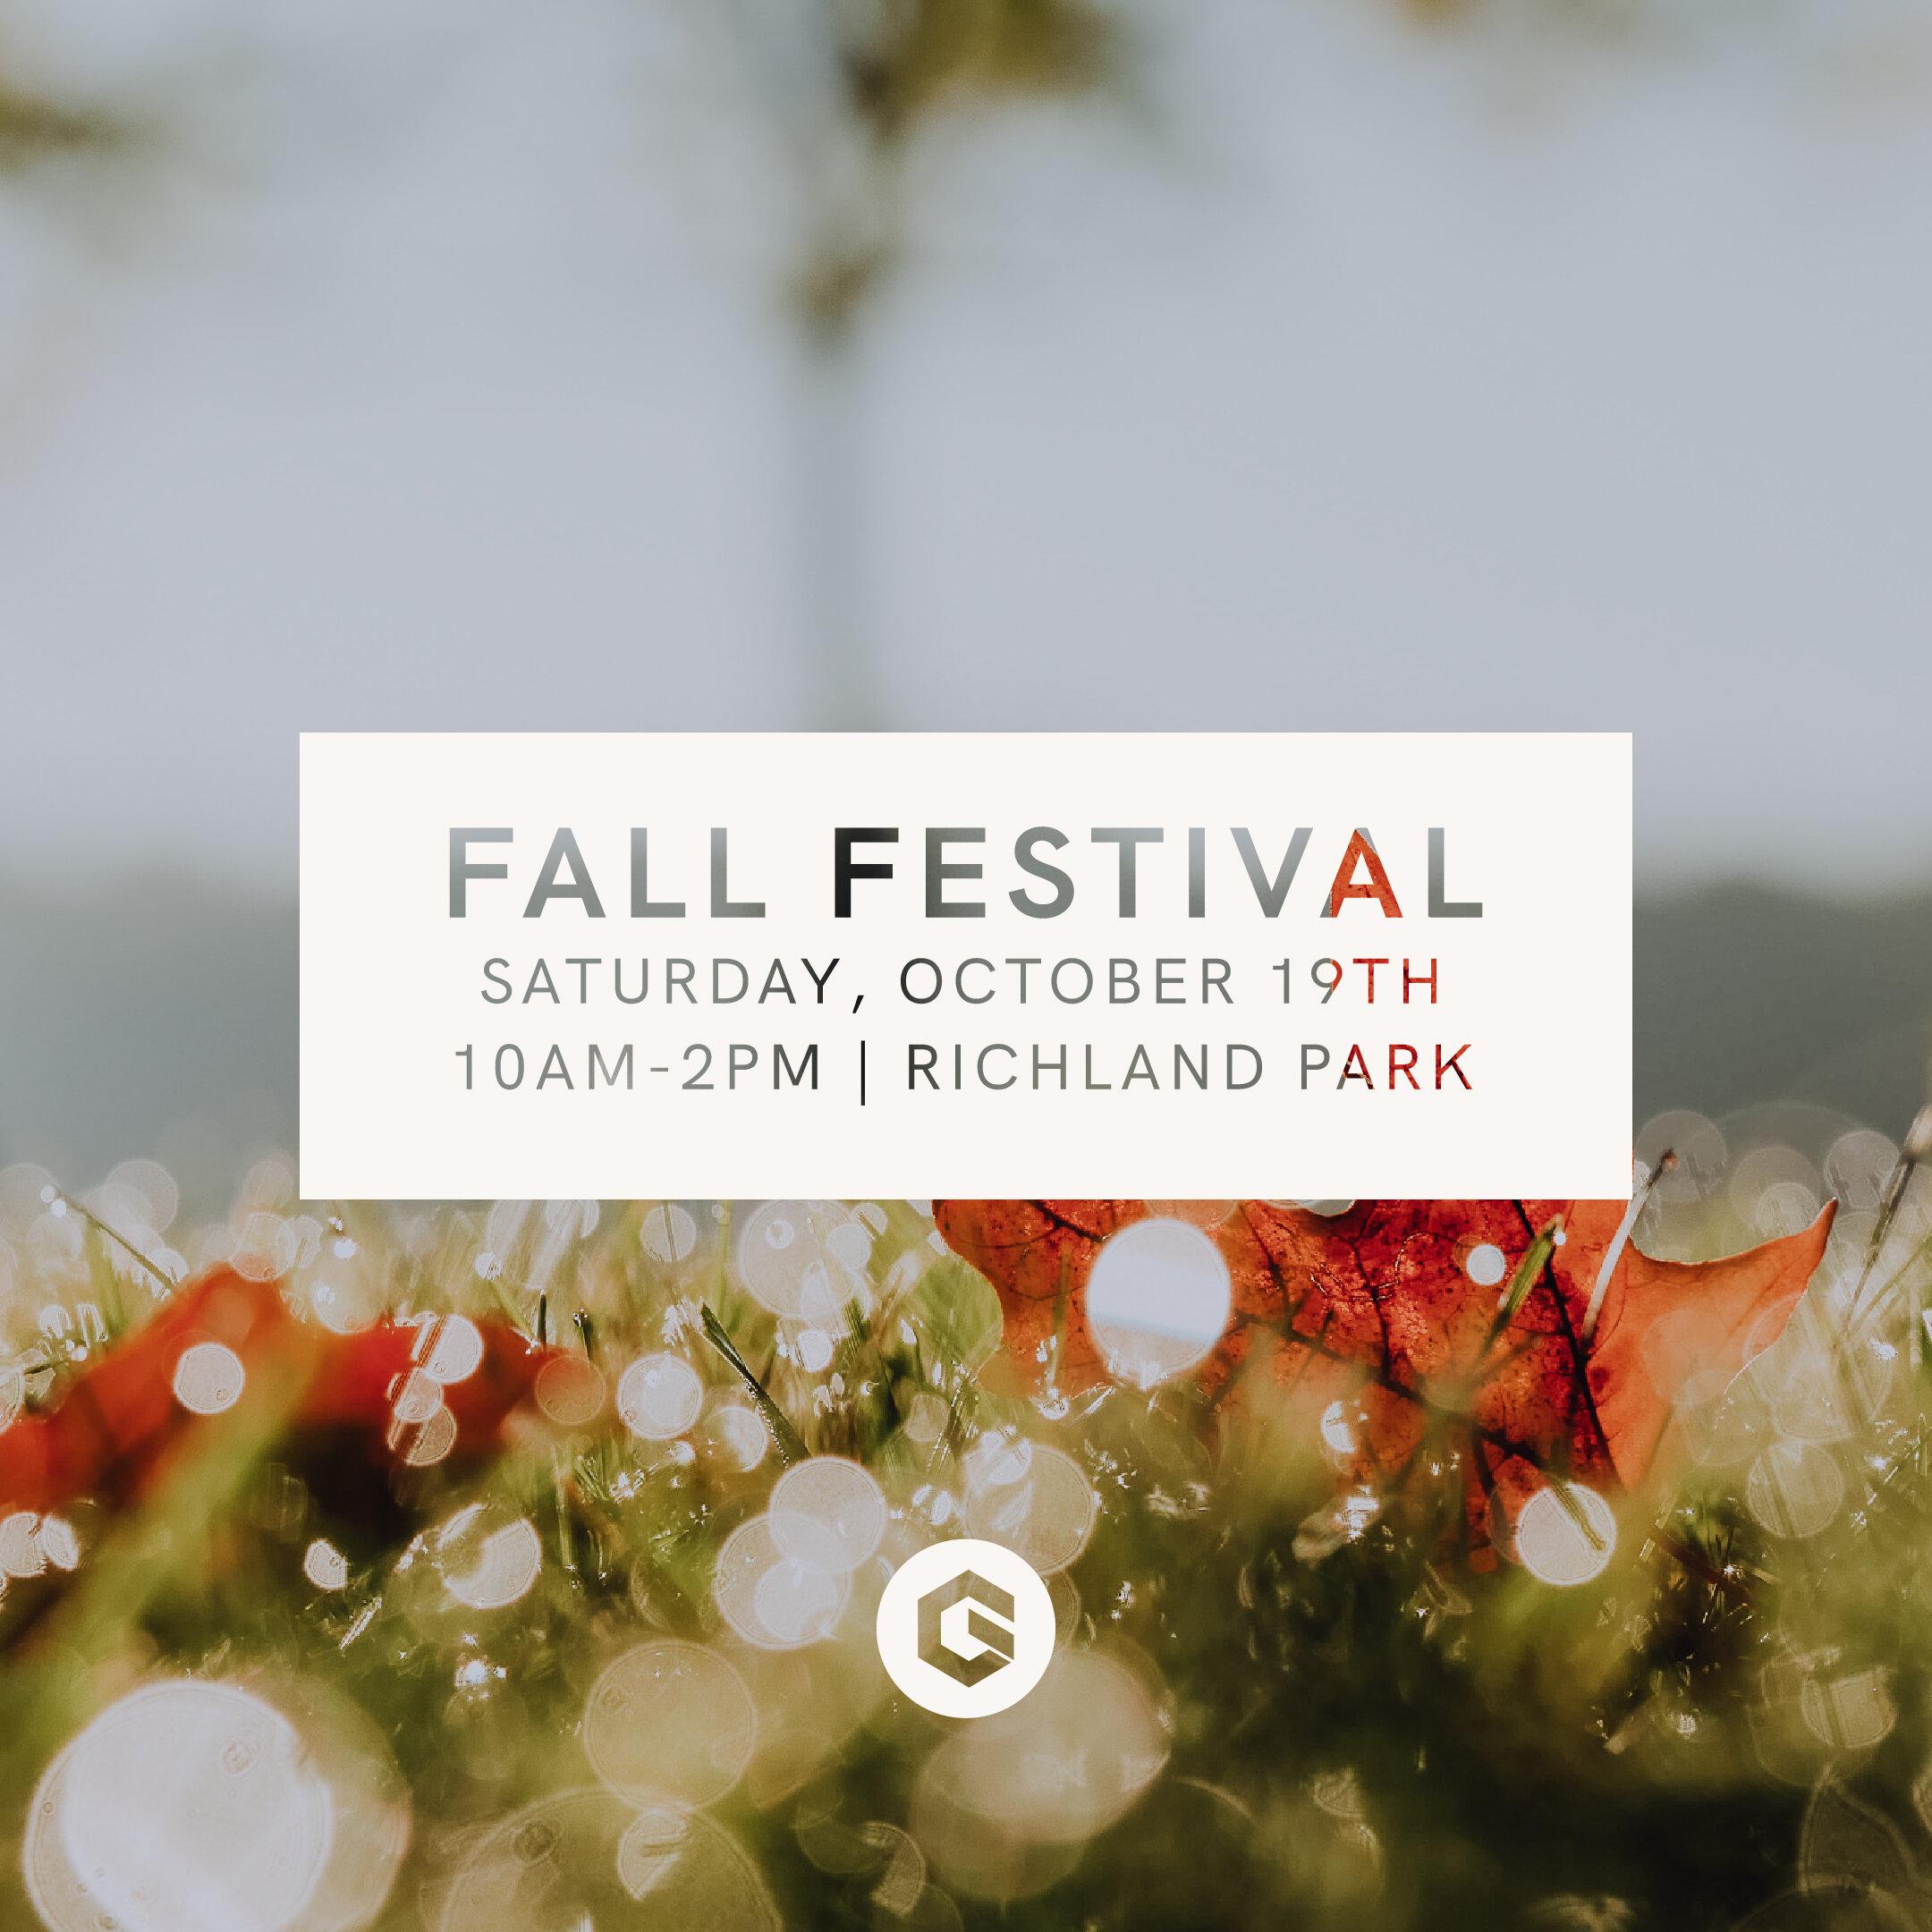 Fall Festival GraphicInstagram.jpg